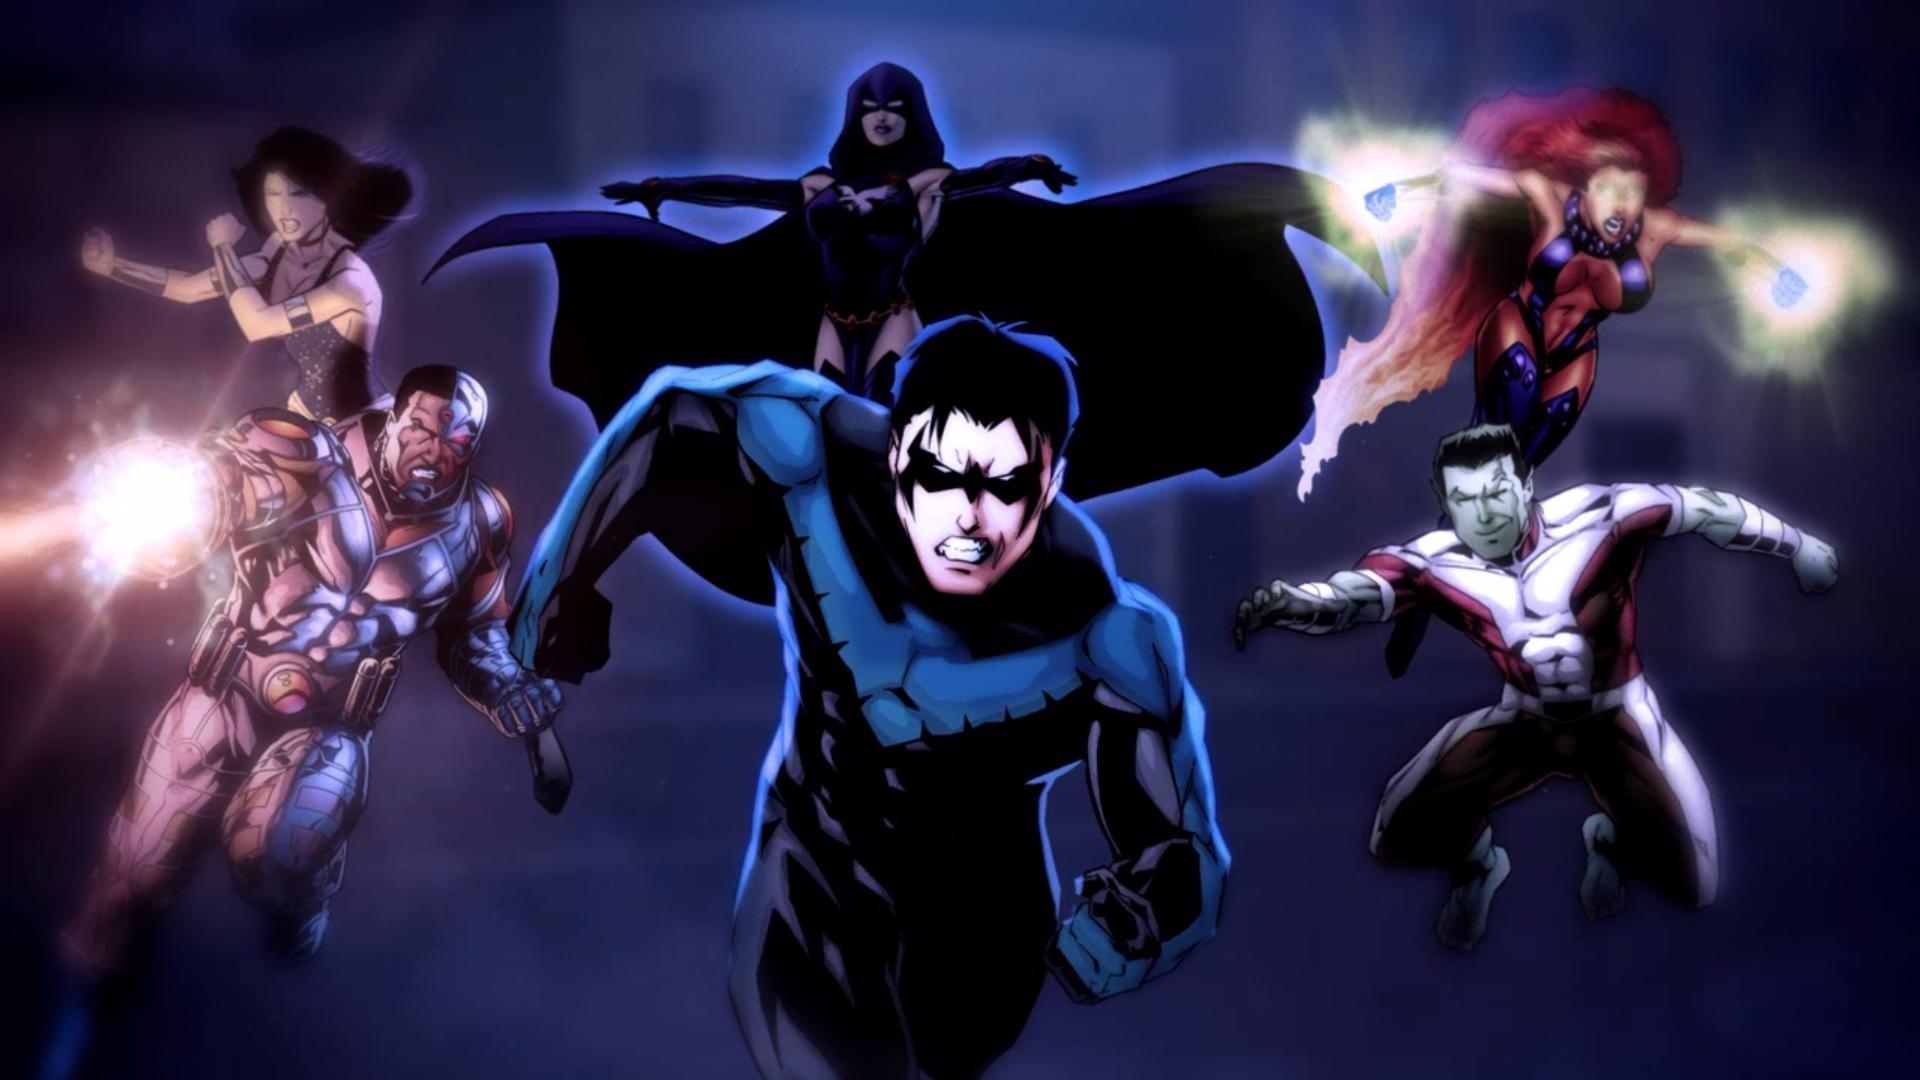 HD Raven Teen Titans Image.